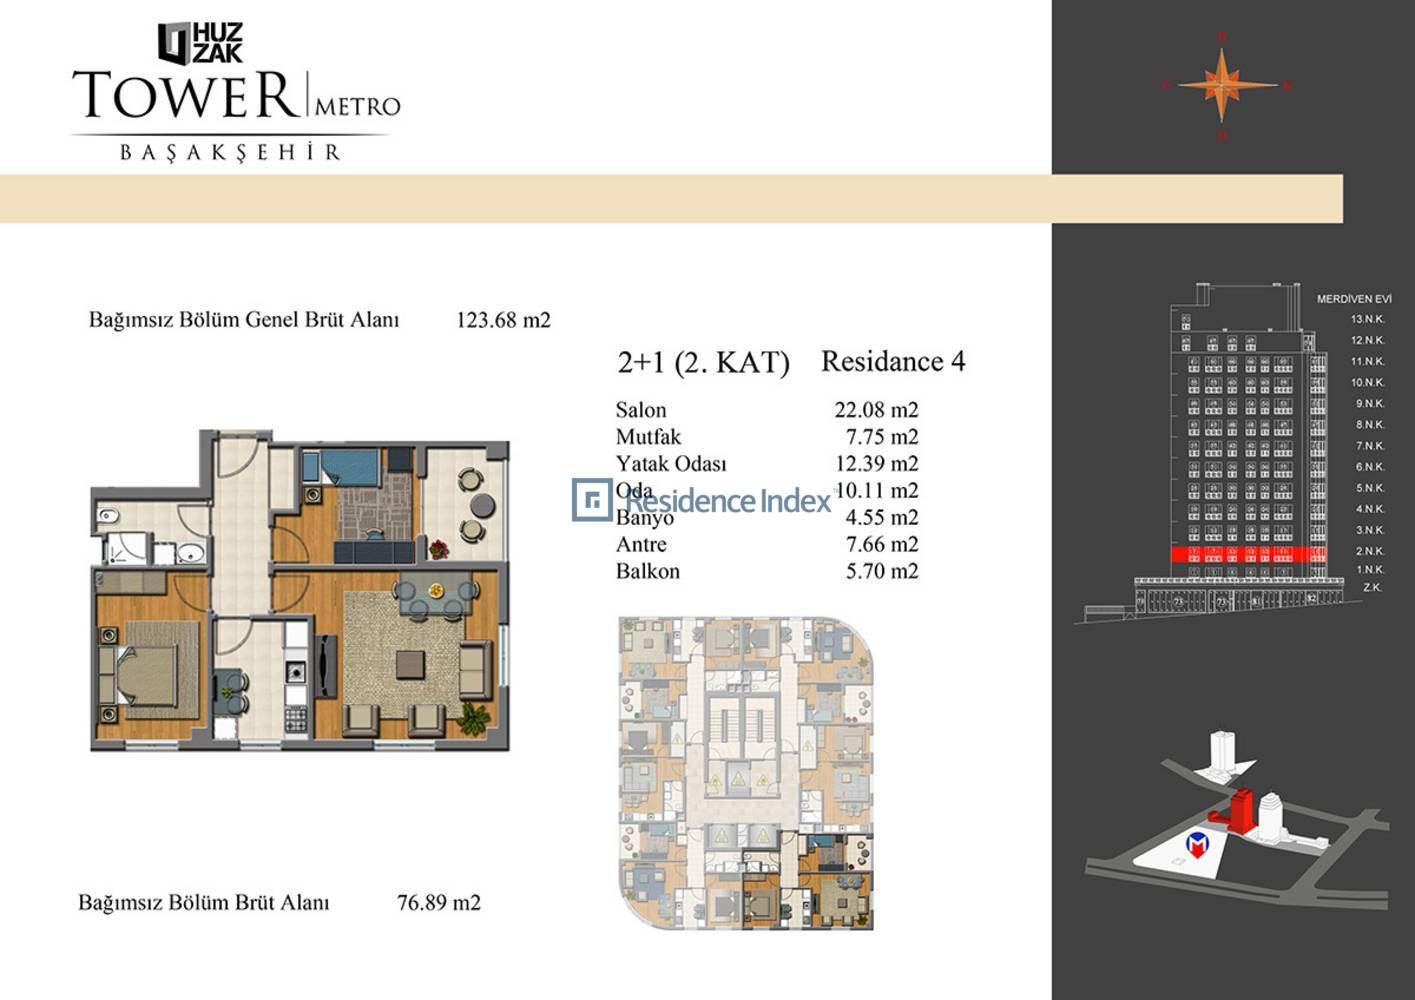 Huzzak Tower Metro Residence 4